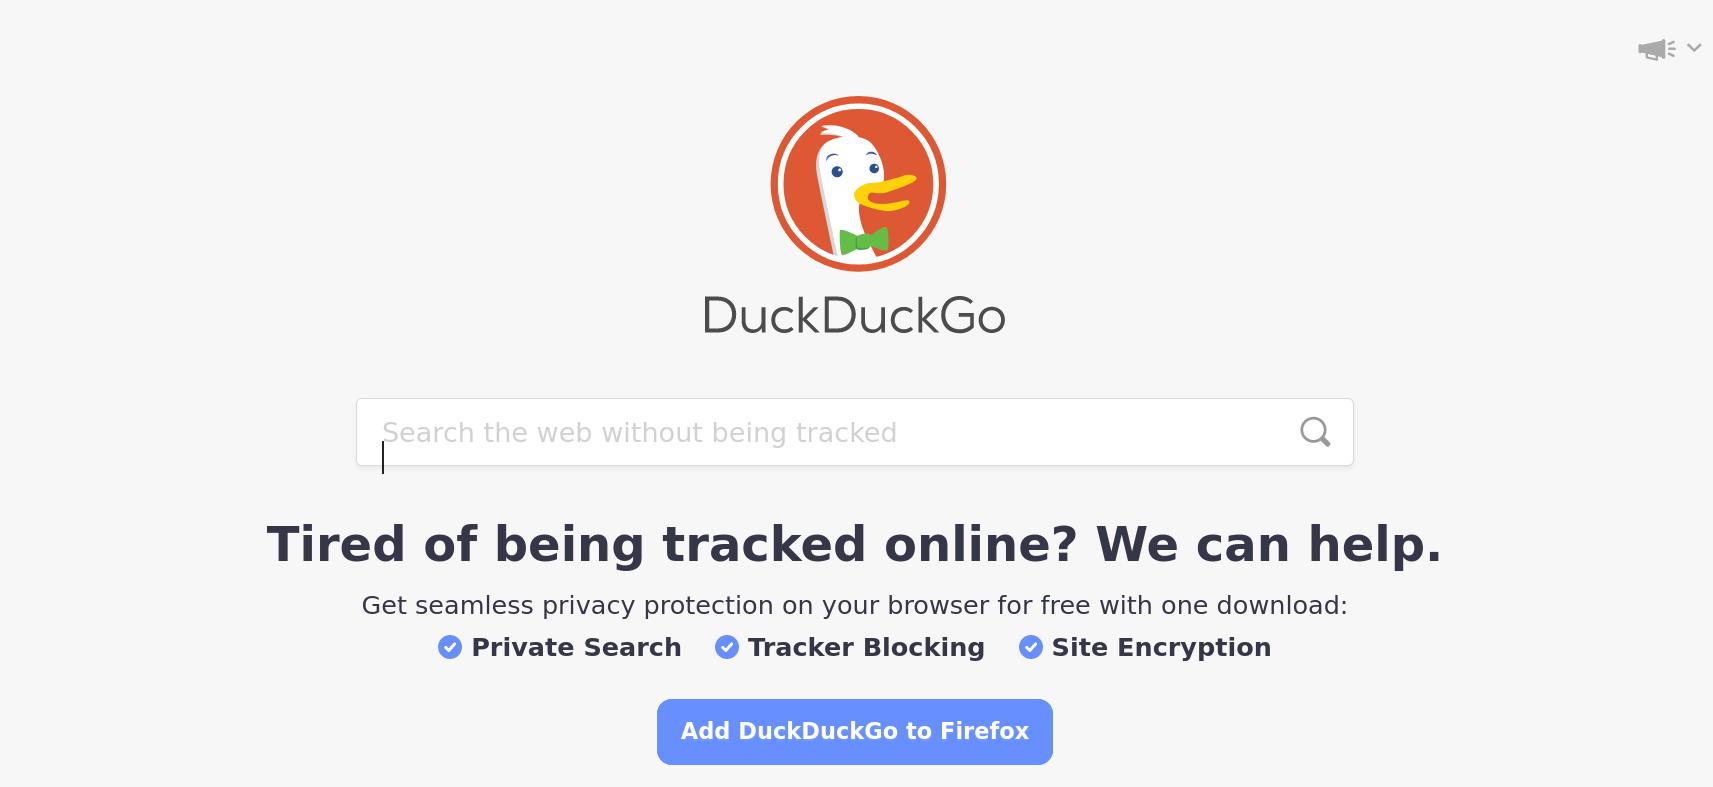 duckduckgo - DuckDuckGo πιο δημοφιλής από ποτέ